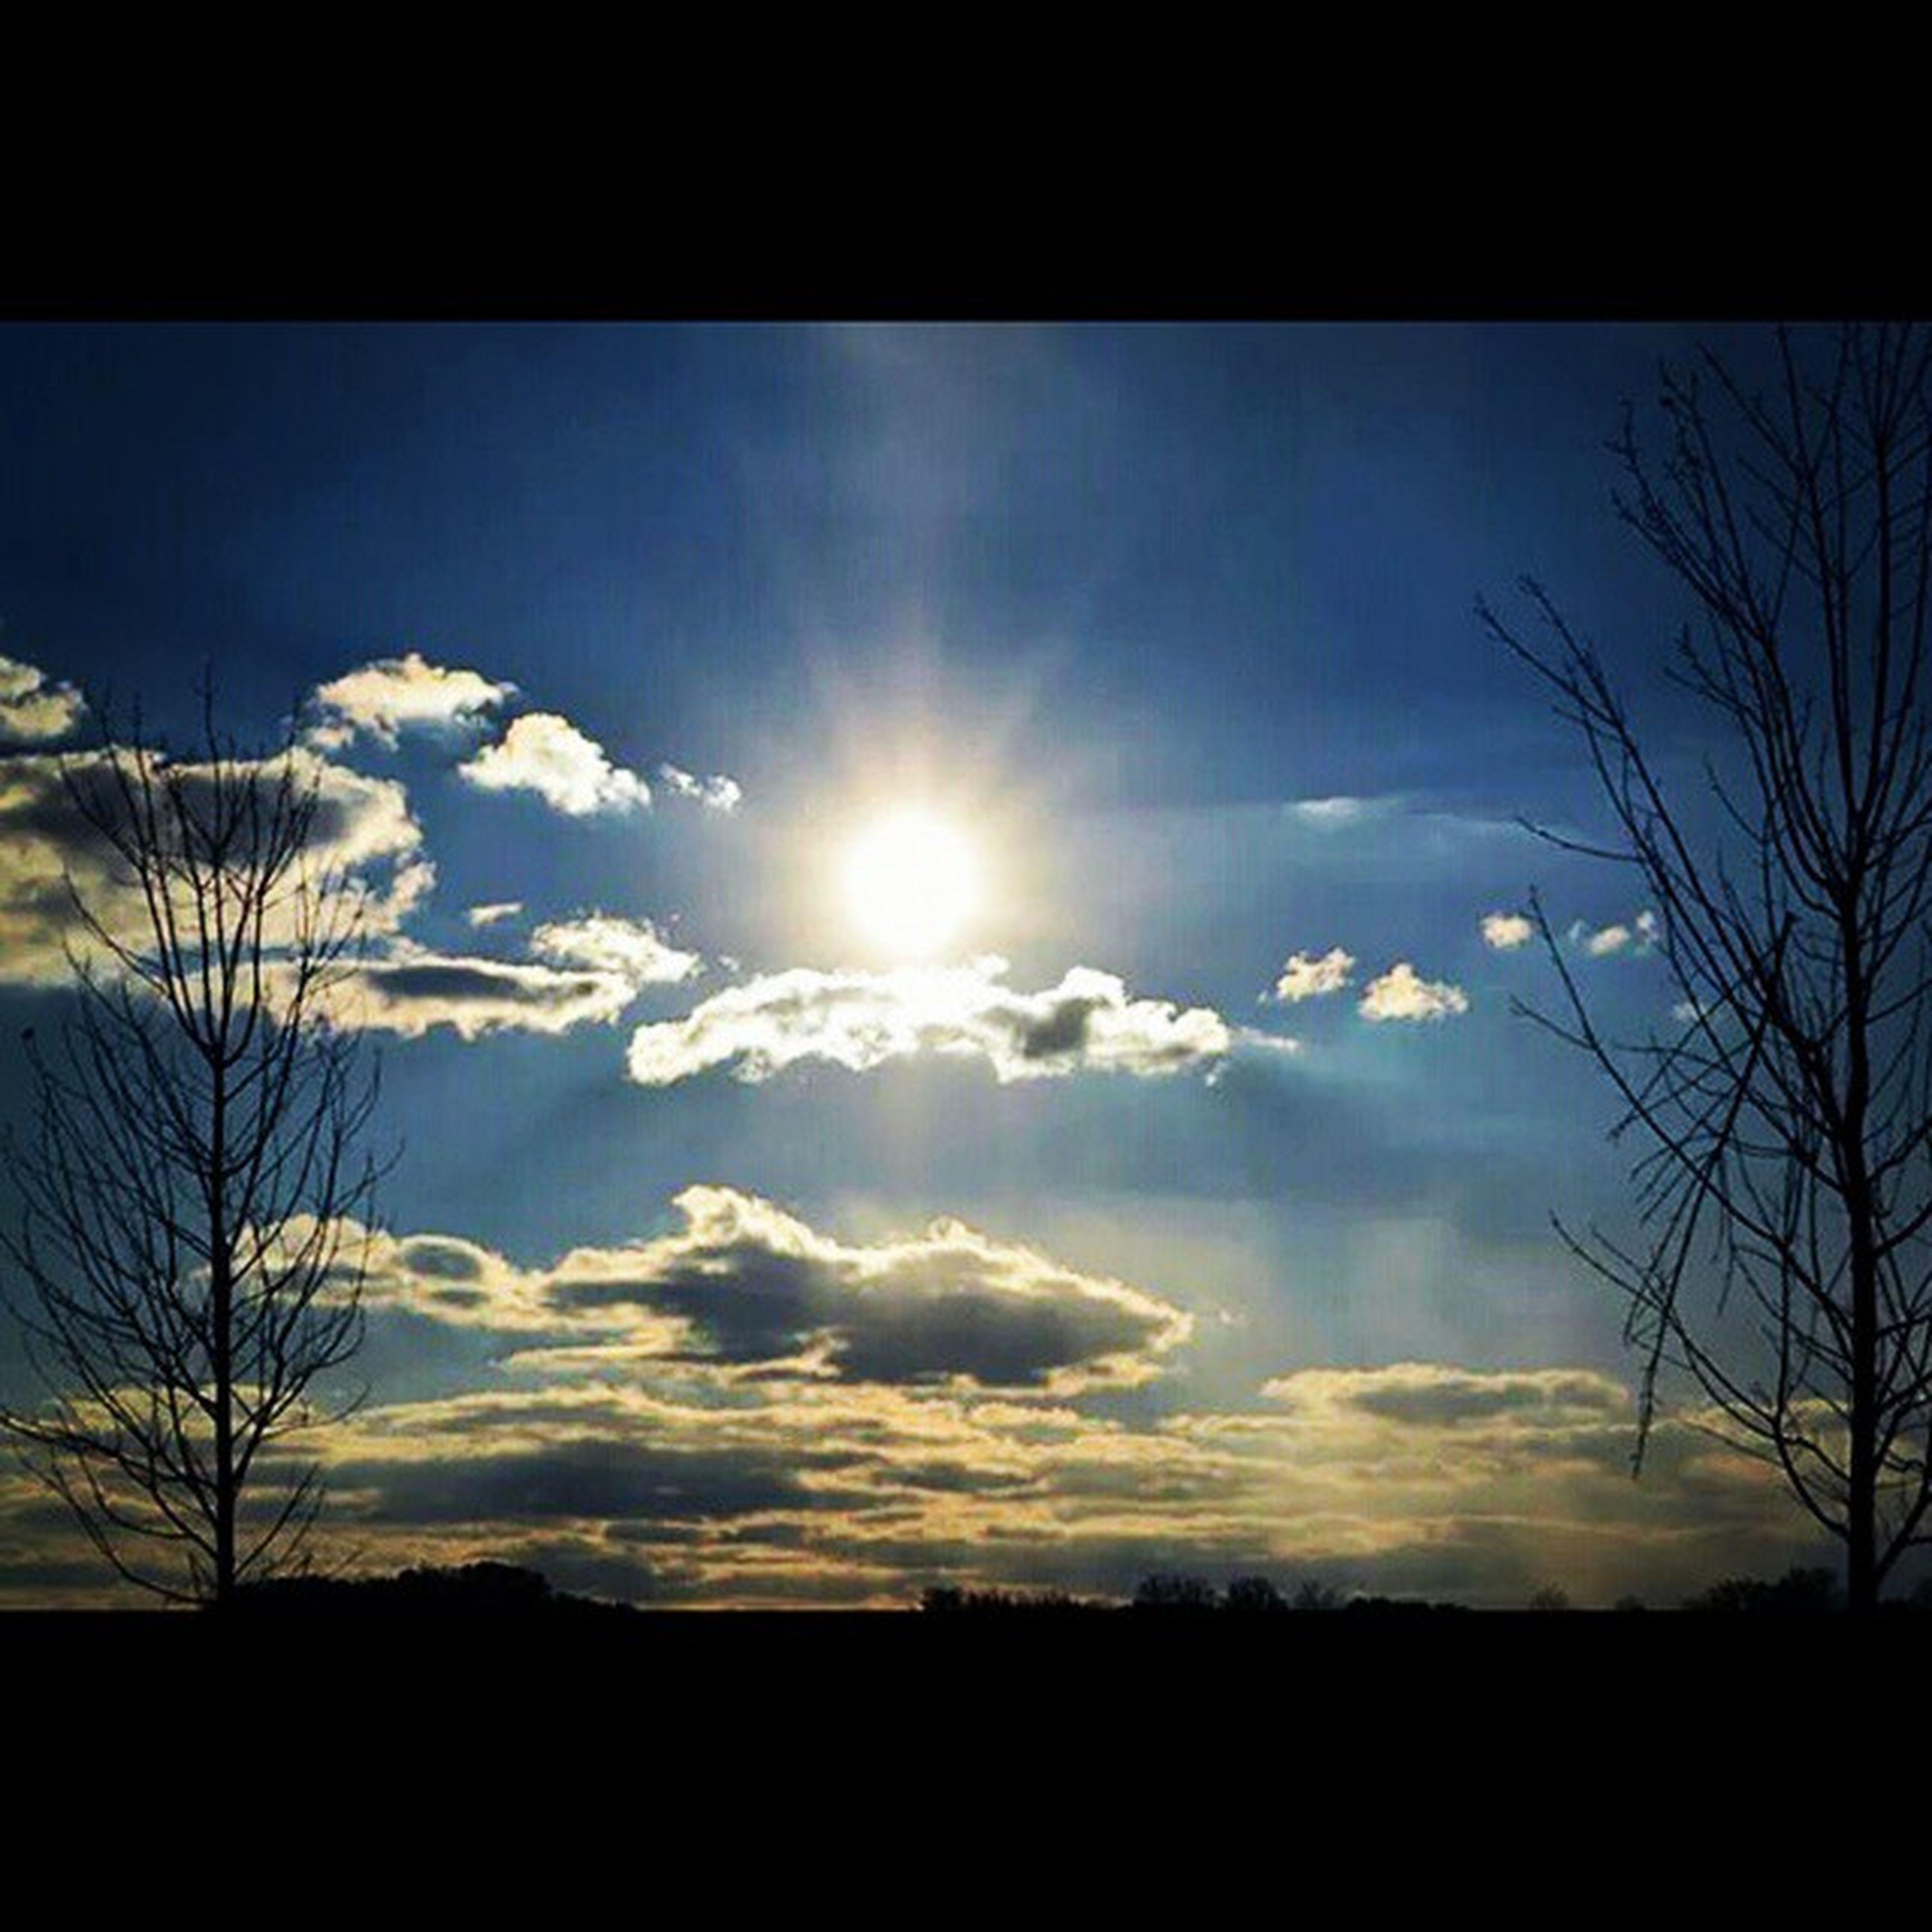 silhouette, sun, sky, sunset, tranquility, tranquil scene, scenics, beauty in nature, sunbeam, sunlight, tree, transfer print, nature, landscape, cloud - sky, bare tree, cloud, lens flare, idyllic, field